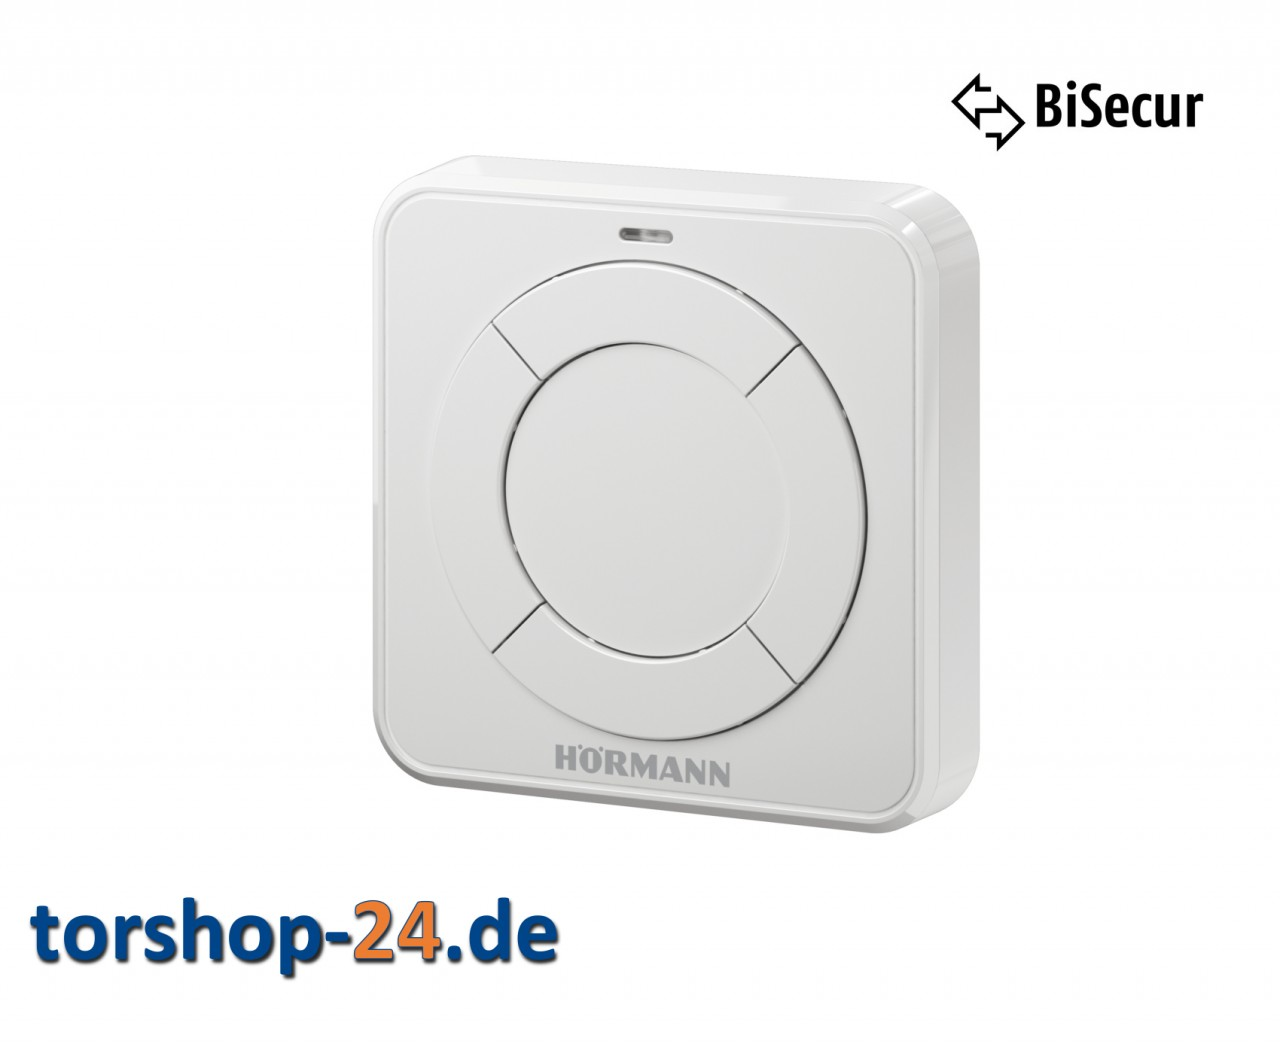 Hörmann Funk-Innentaster FIT 4 BS mit 868 MHz BiSecur